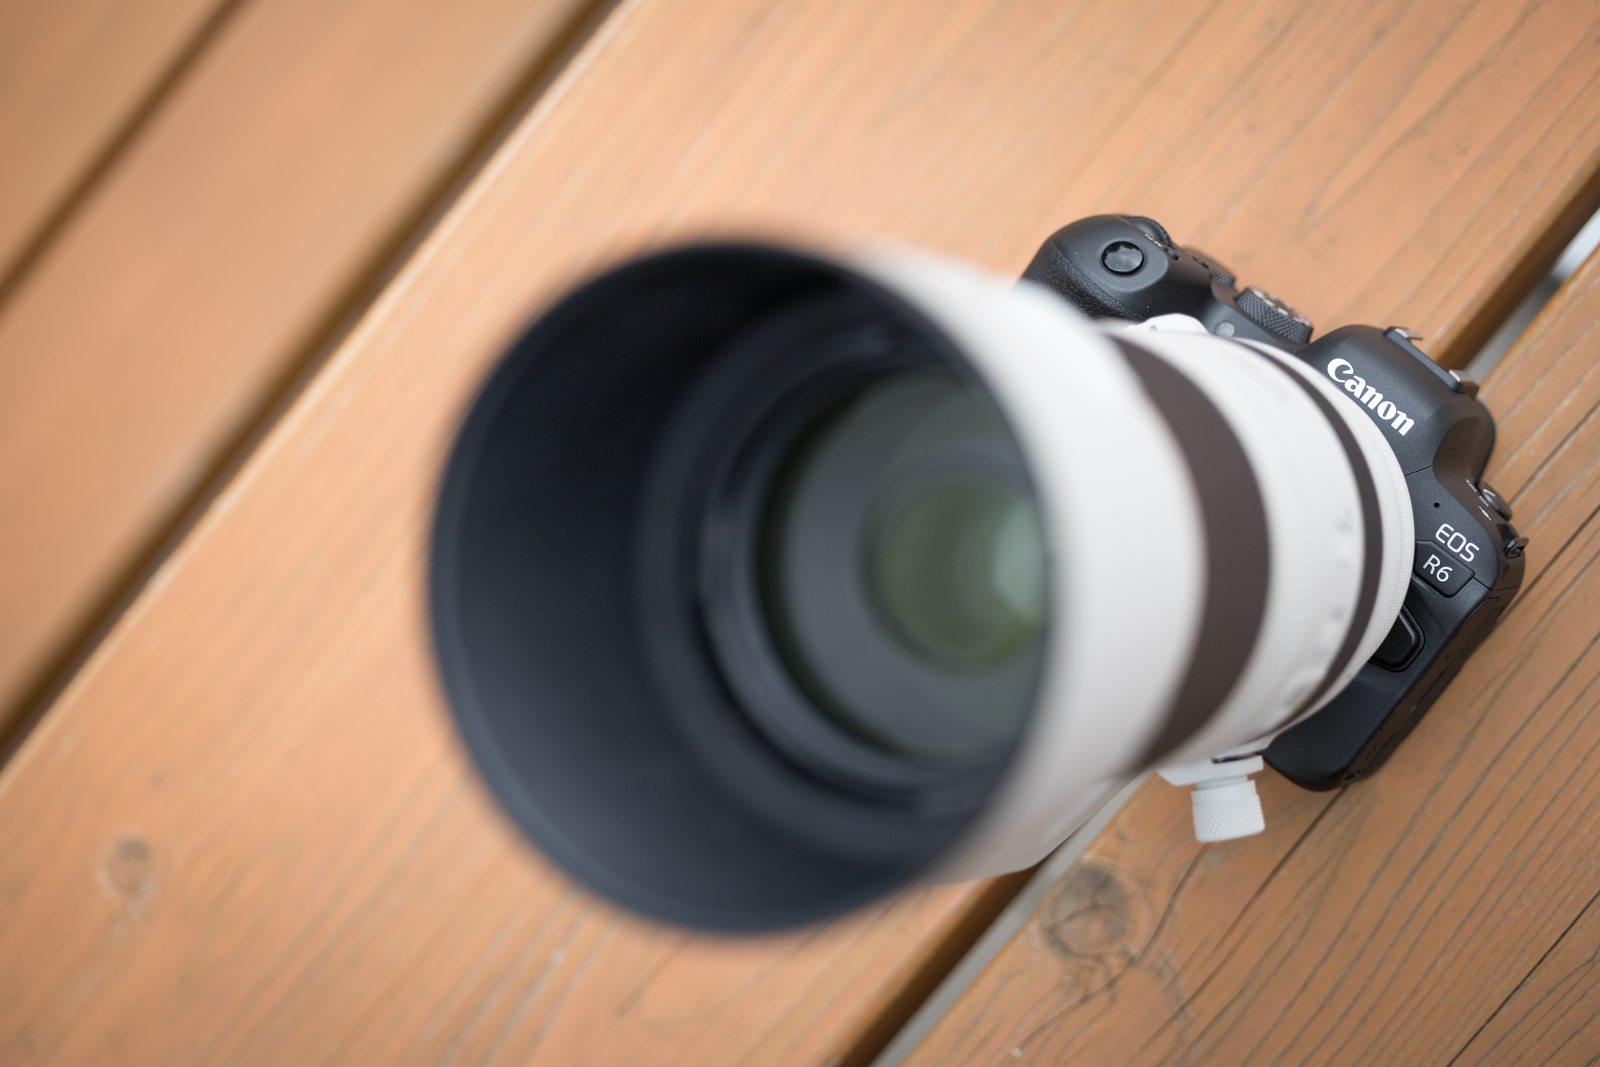 Canon EOS R6 recenze (objektiv Canon RF 100-500mm f /4.5-7.1L IS USM)